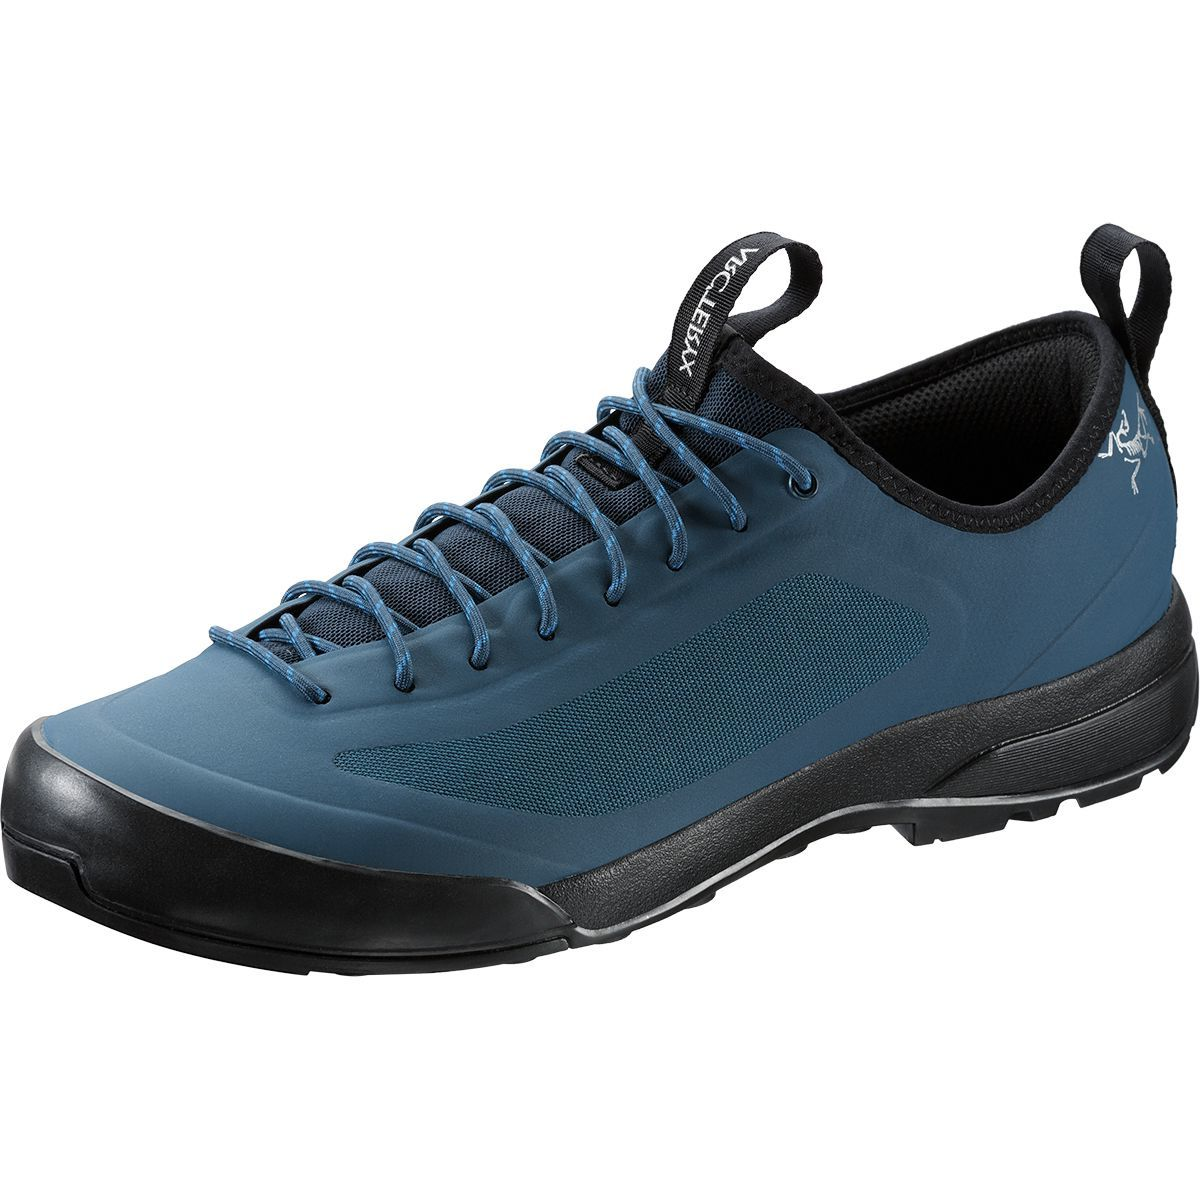 Arc'teryx Acrux SL Approach Shoe - Men's